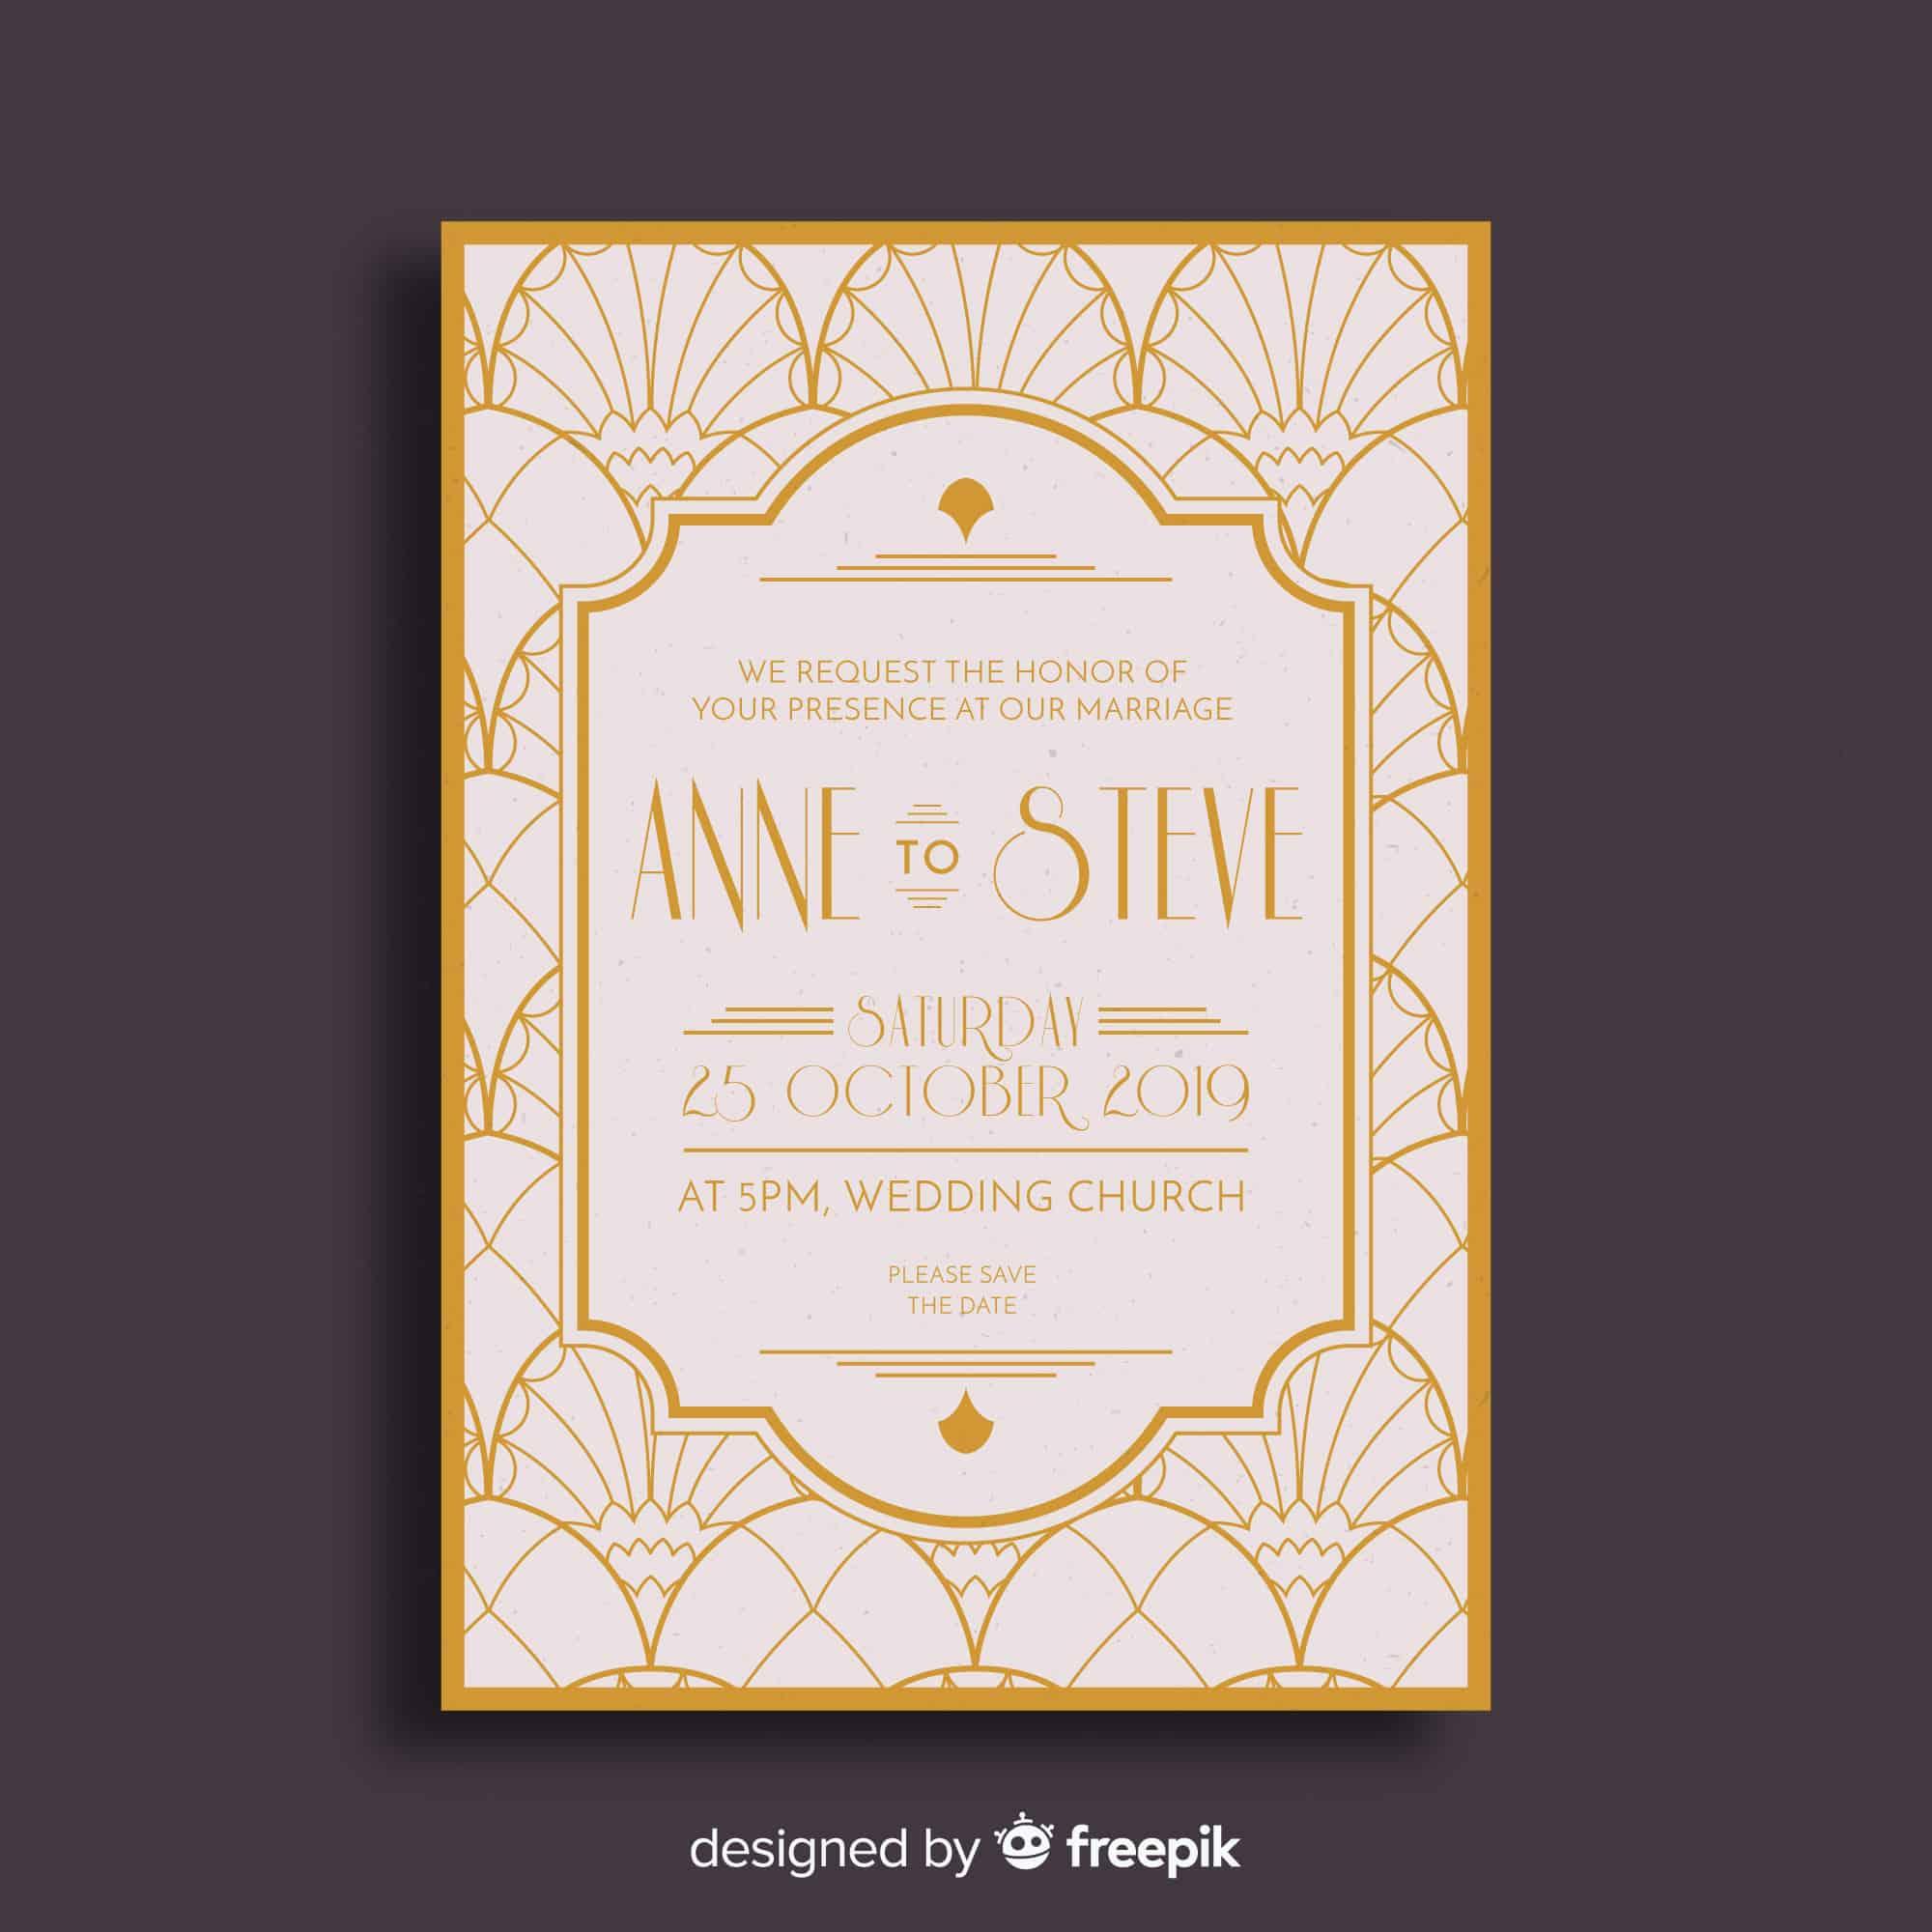 Noir - Wedding Invitation